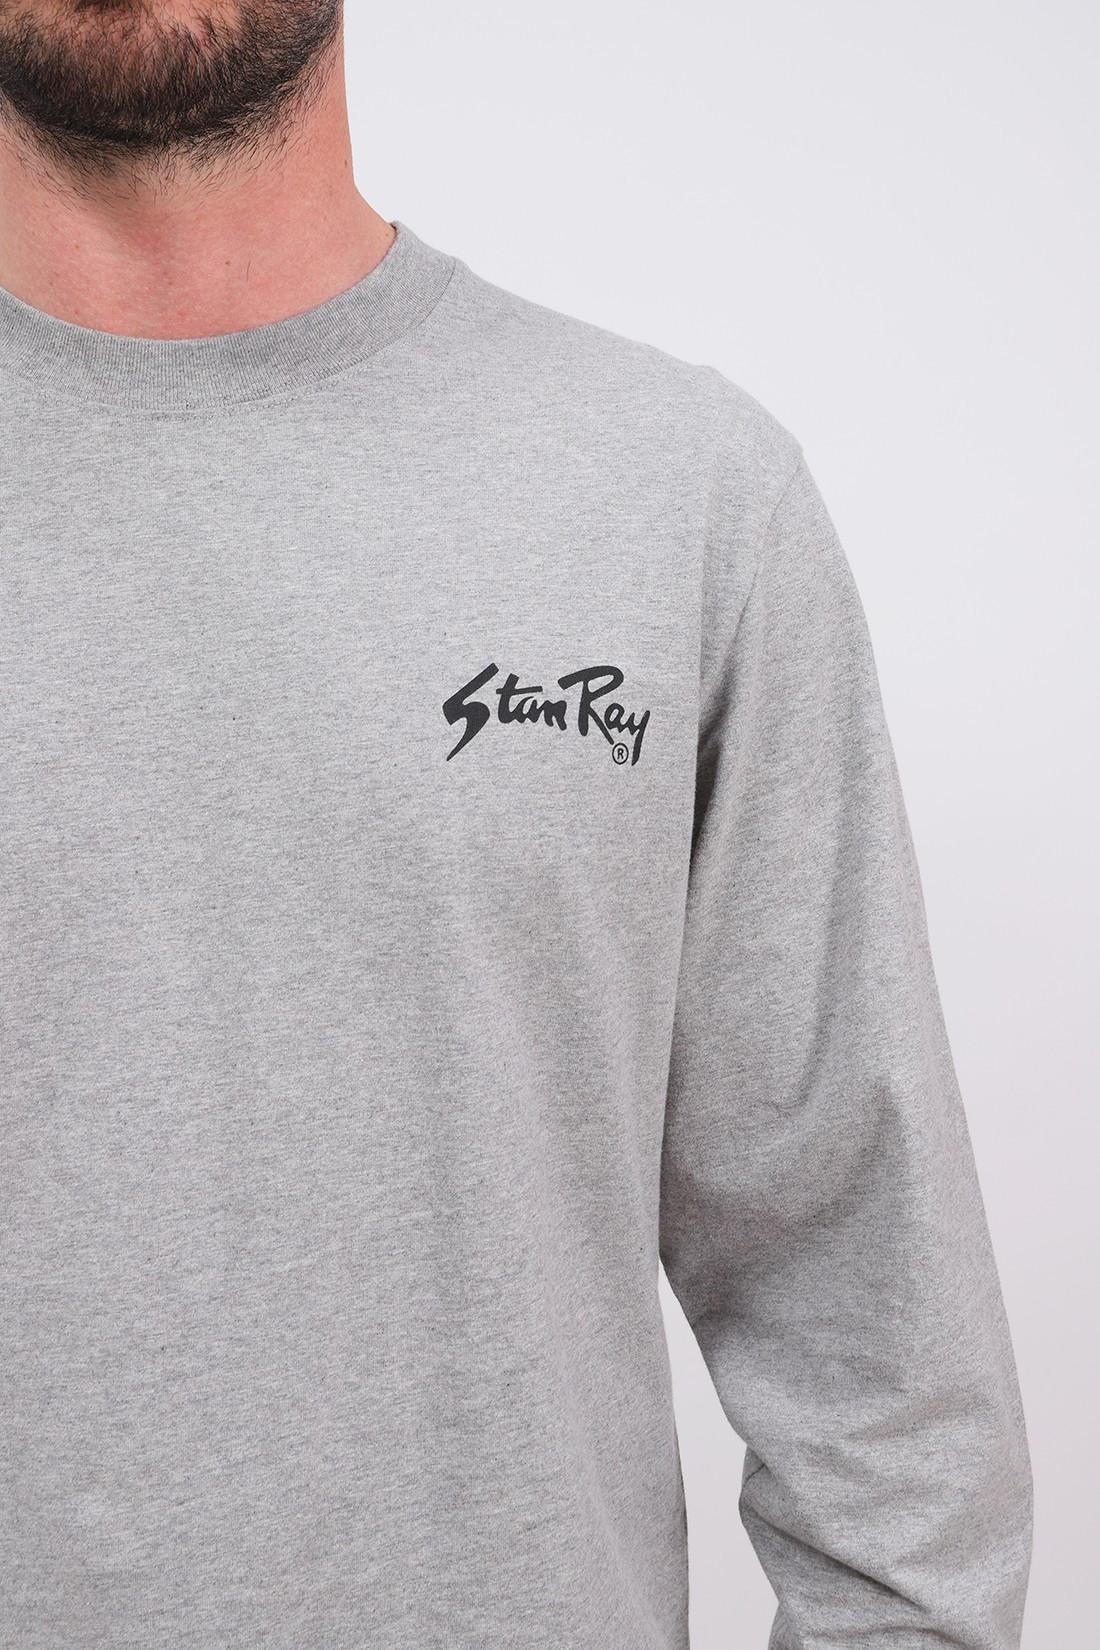 STAN RAY / Stan og ls tee Grey heather